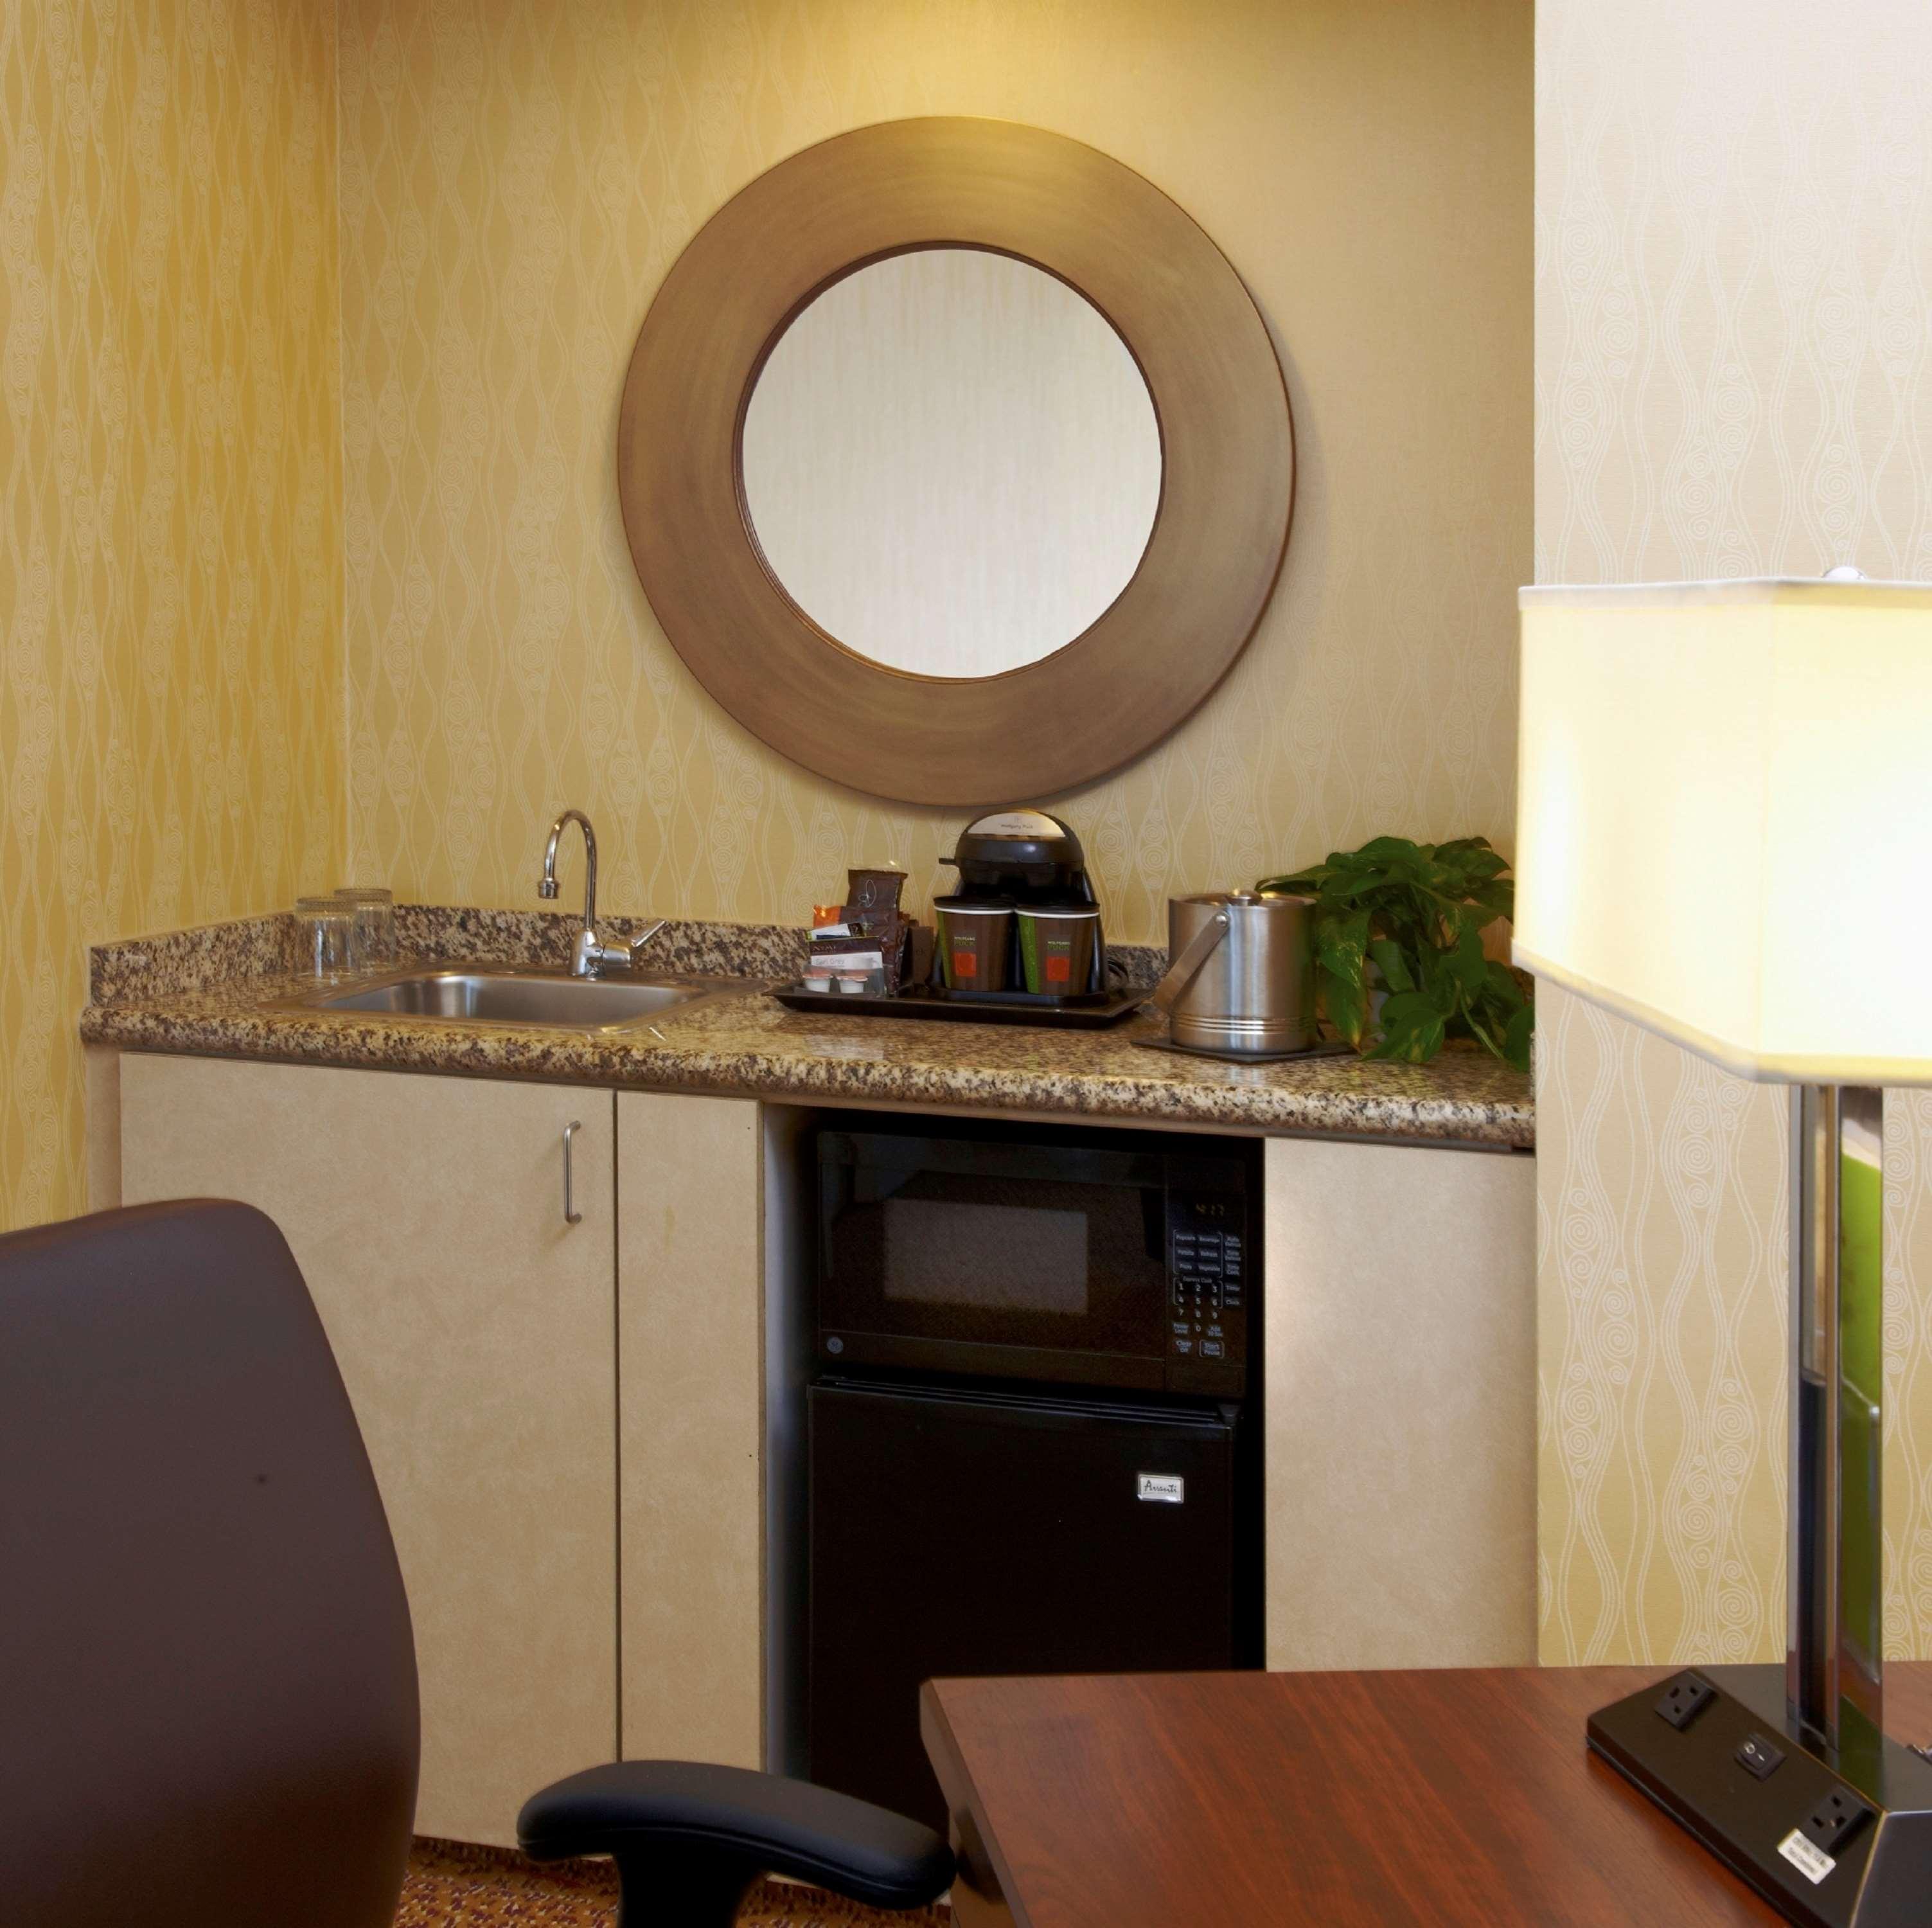 DoubleTree Suites by Hilton Hotel Santa Monica image 10